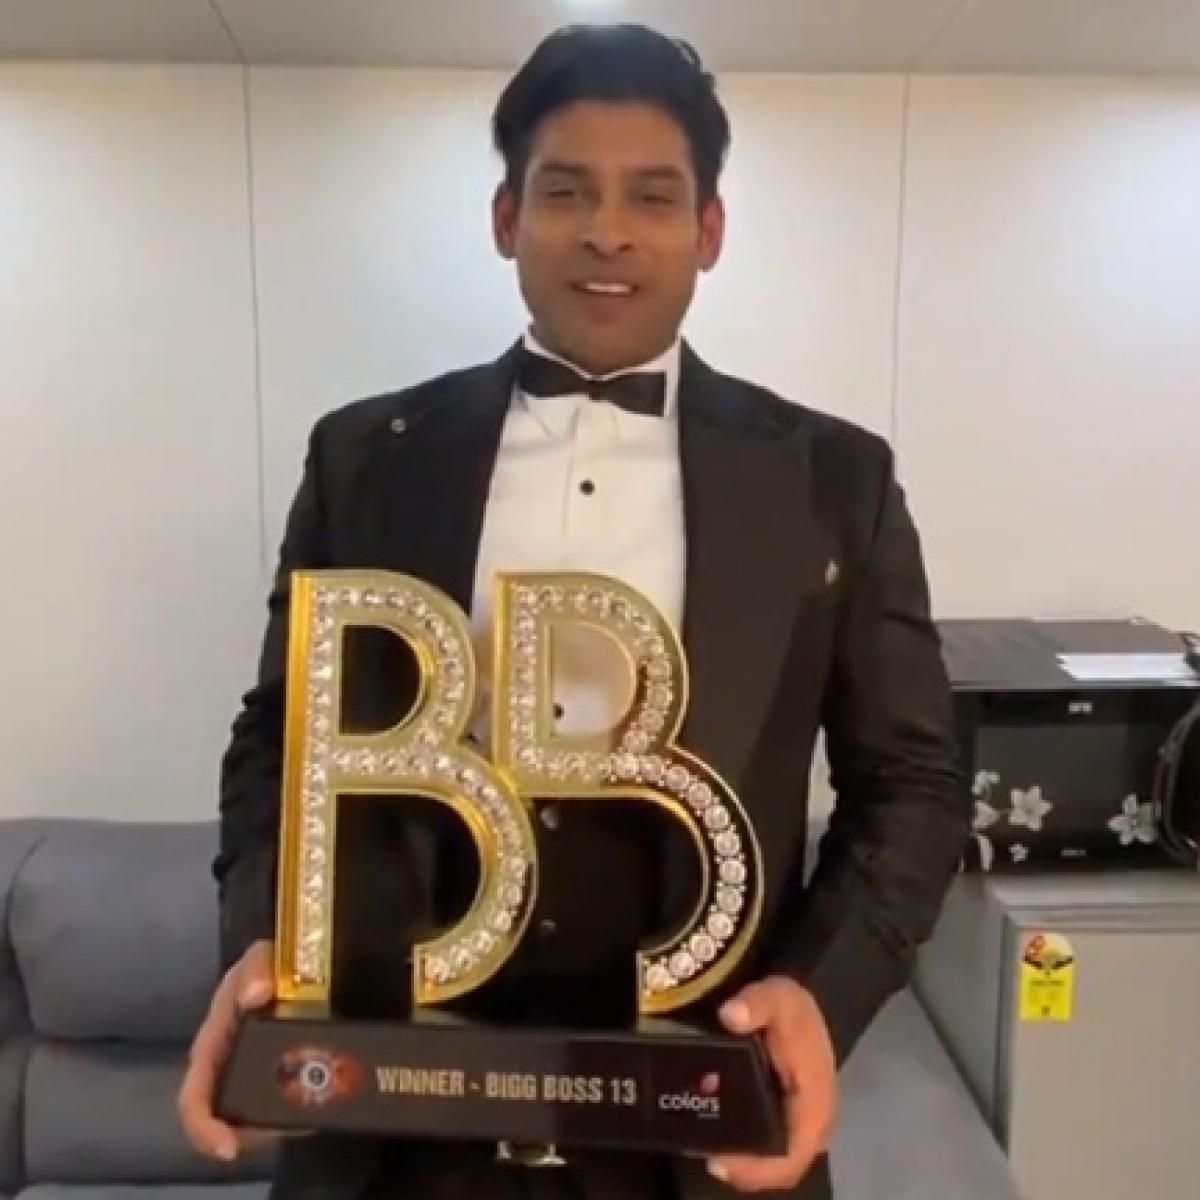 Sidharth Shukla wins 'Bigg Boss 13', defeats Asim Riaz